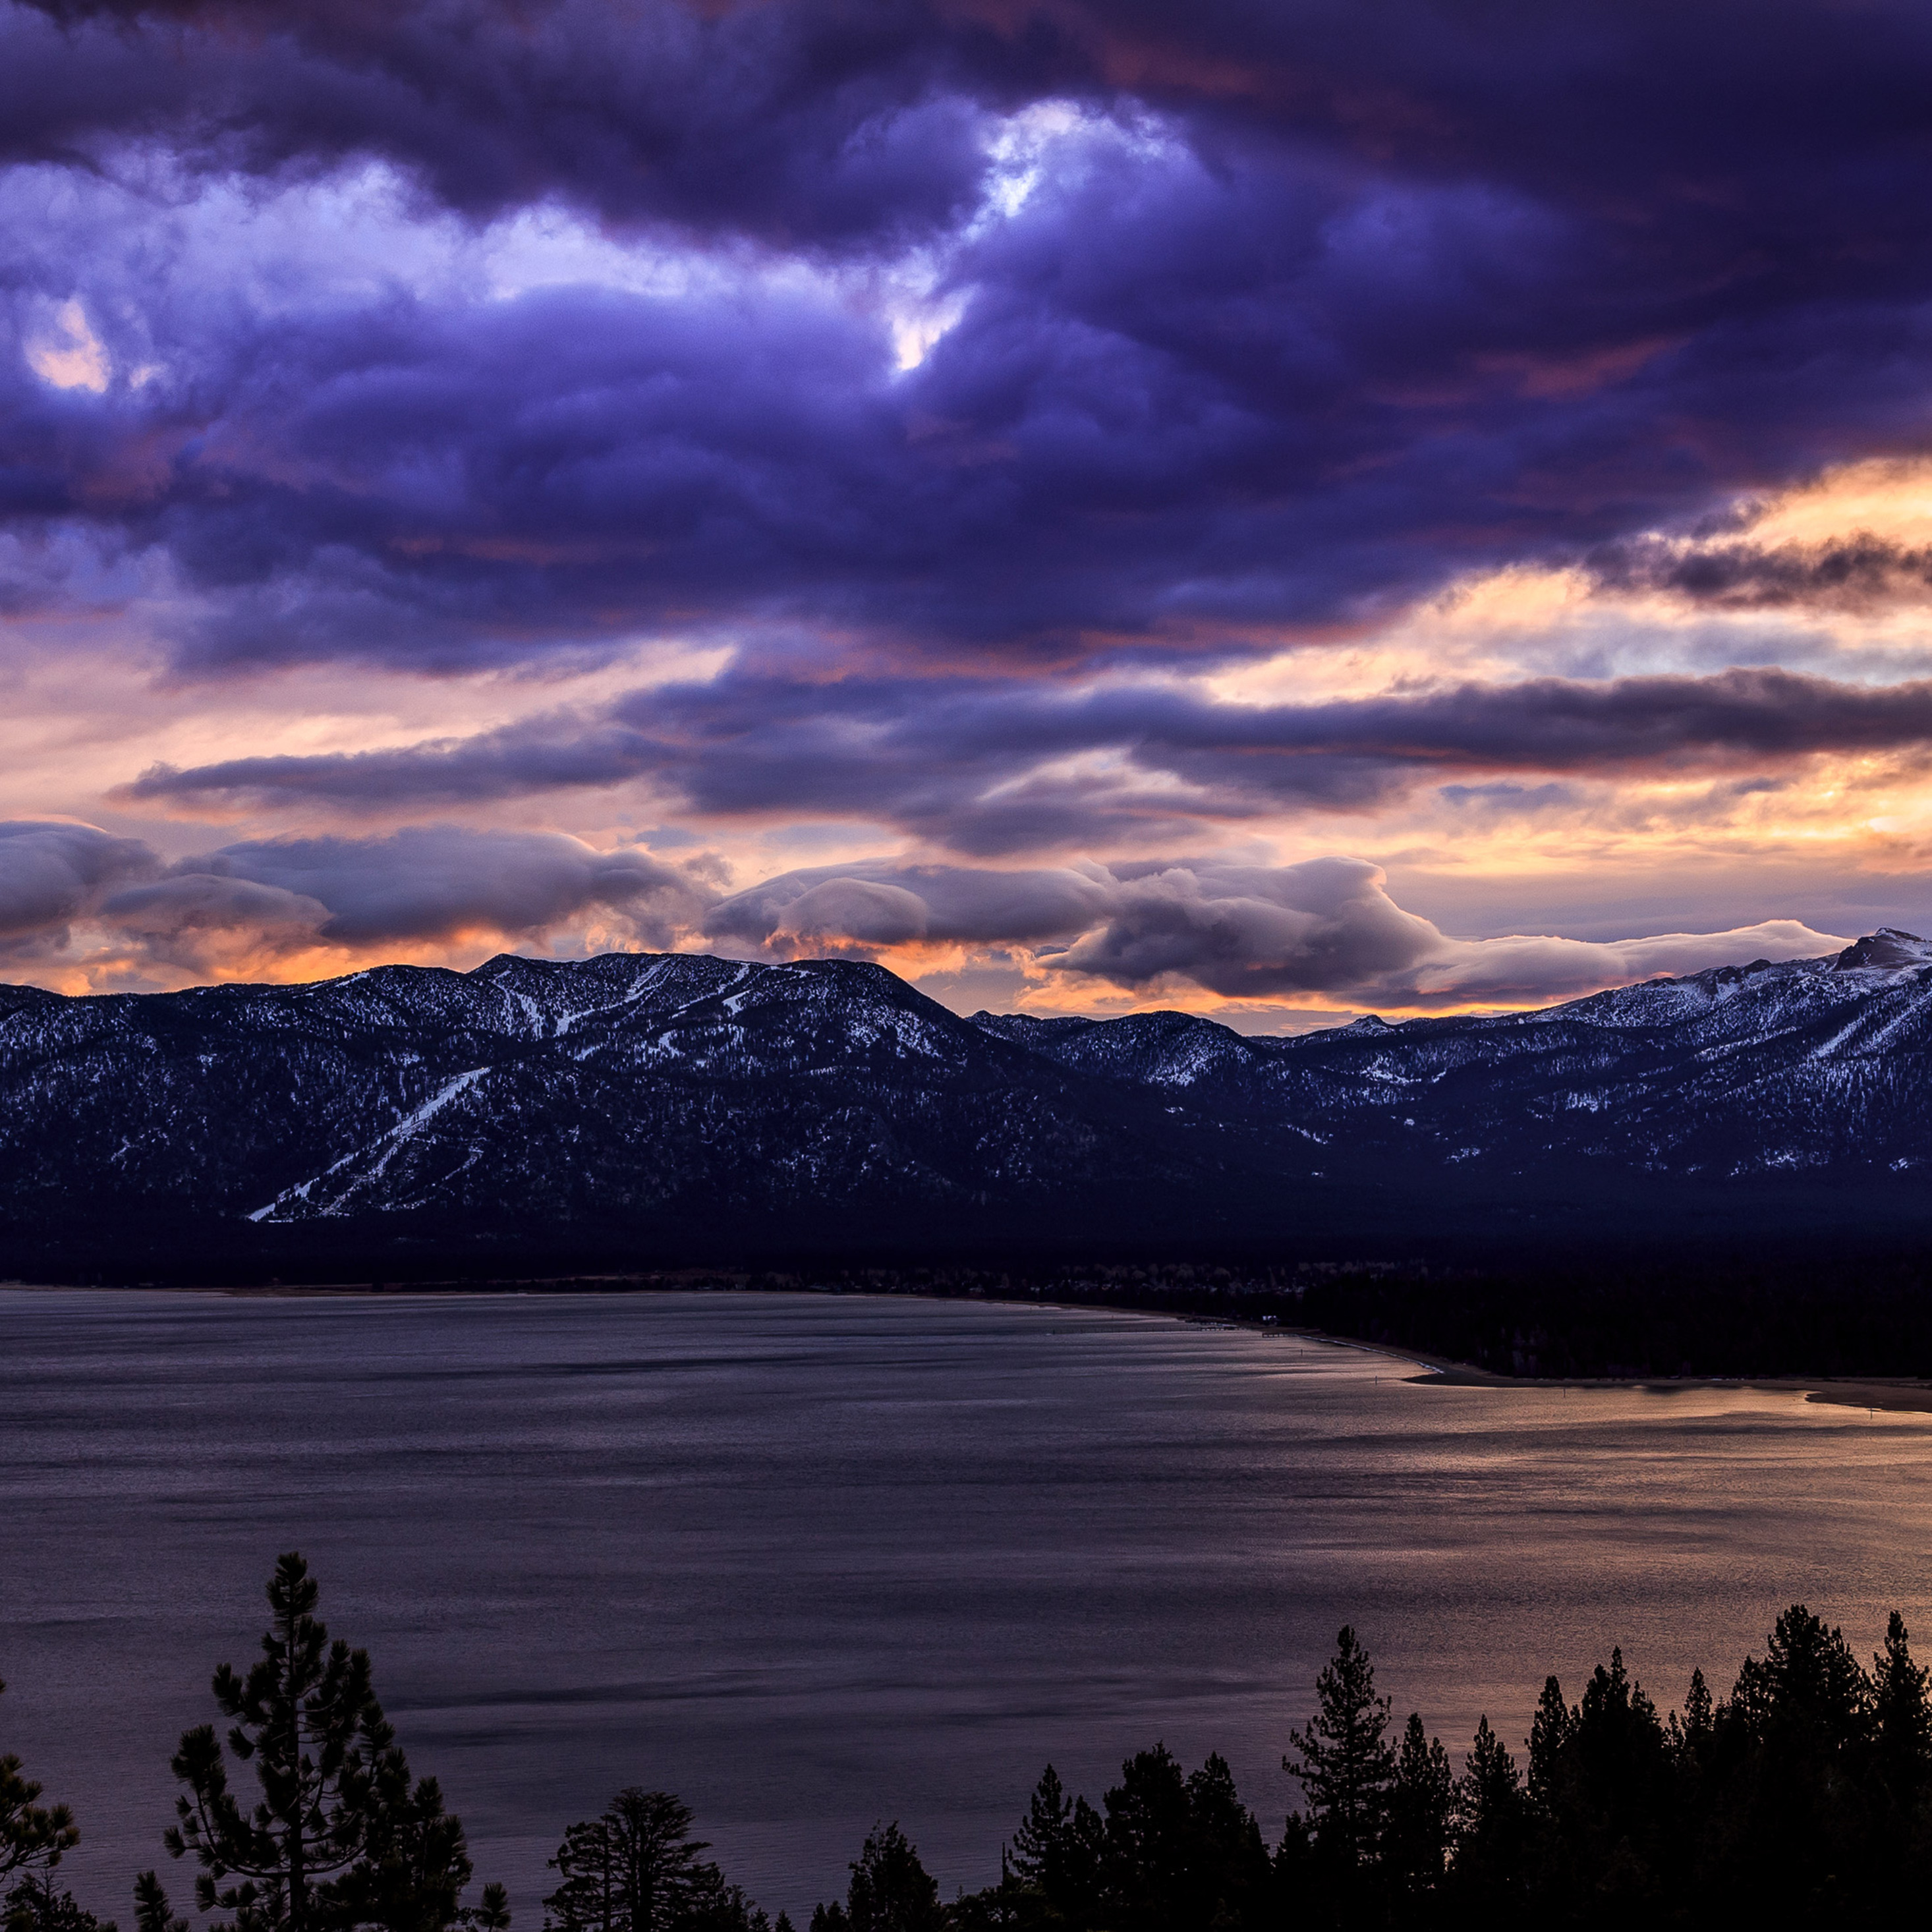 2932x2932 South Lake Tahoe Ipad Pro Retina Display Hd 4k